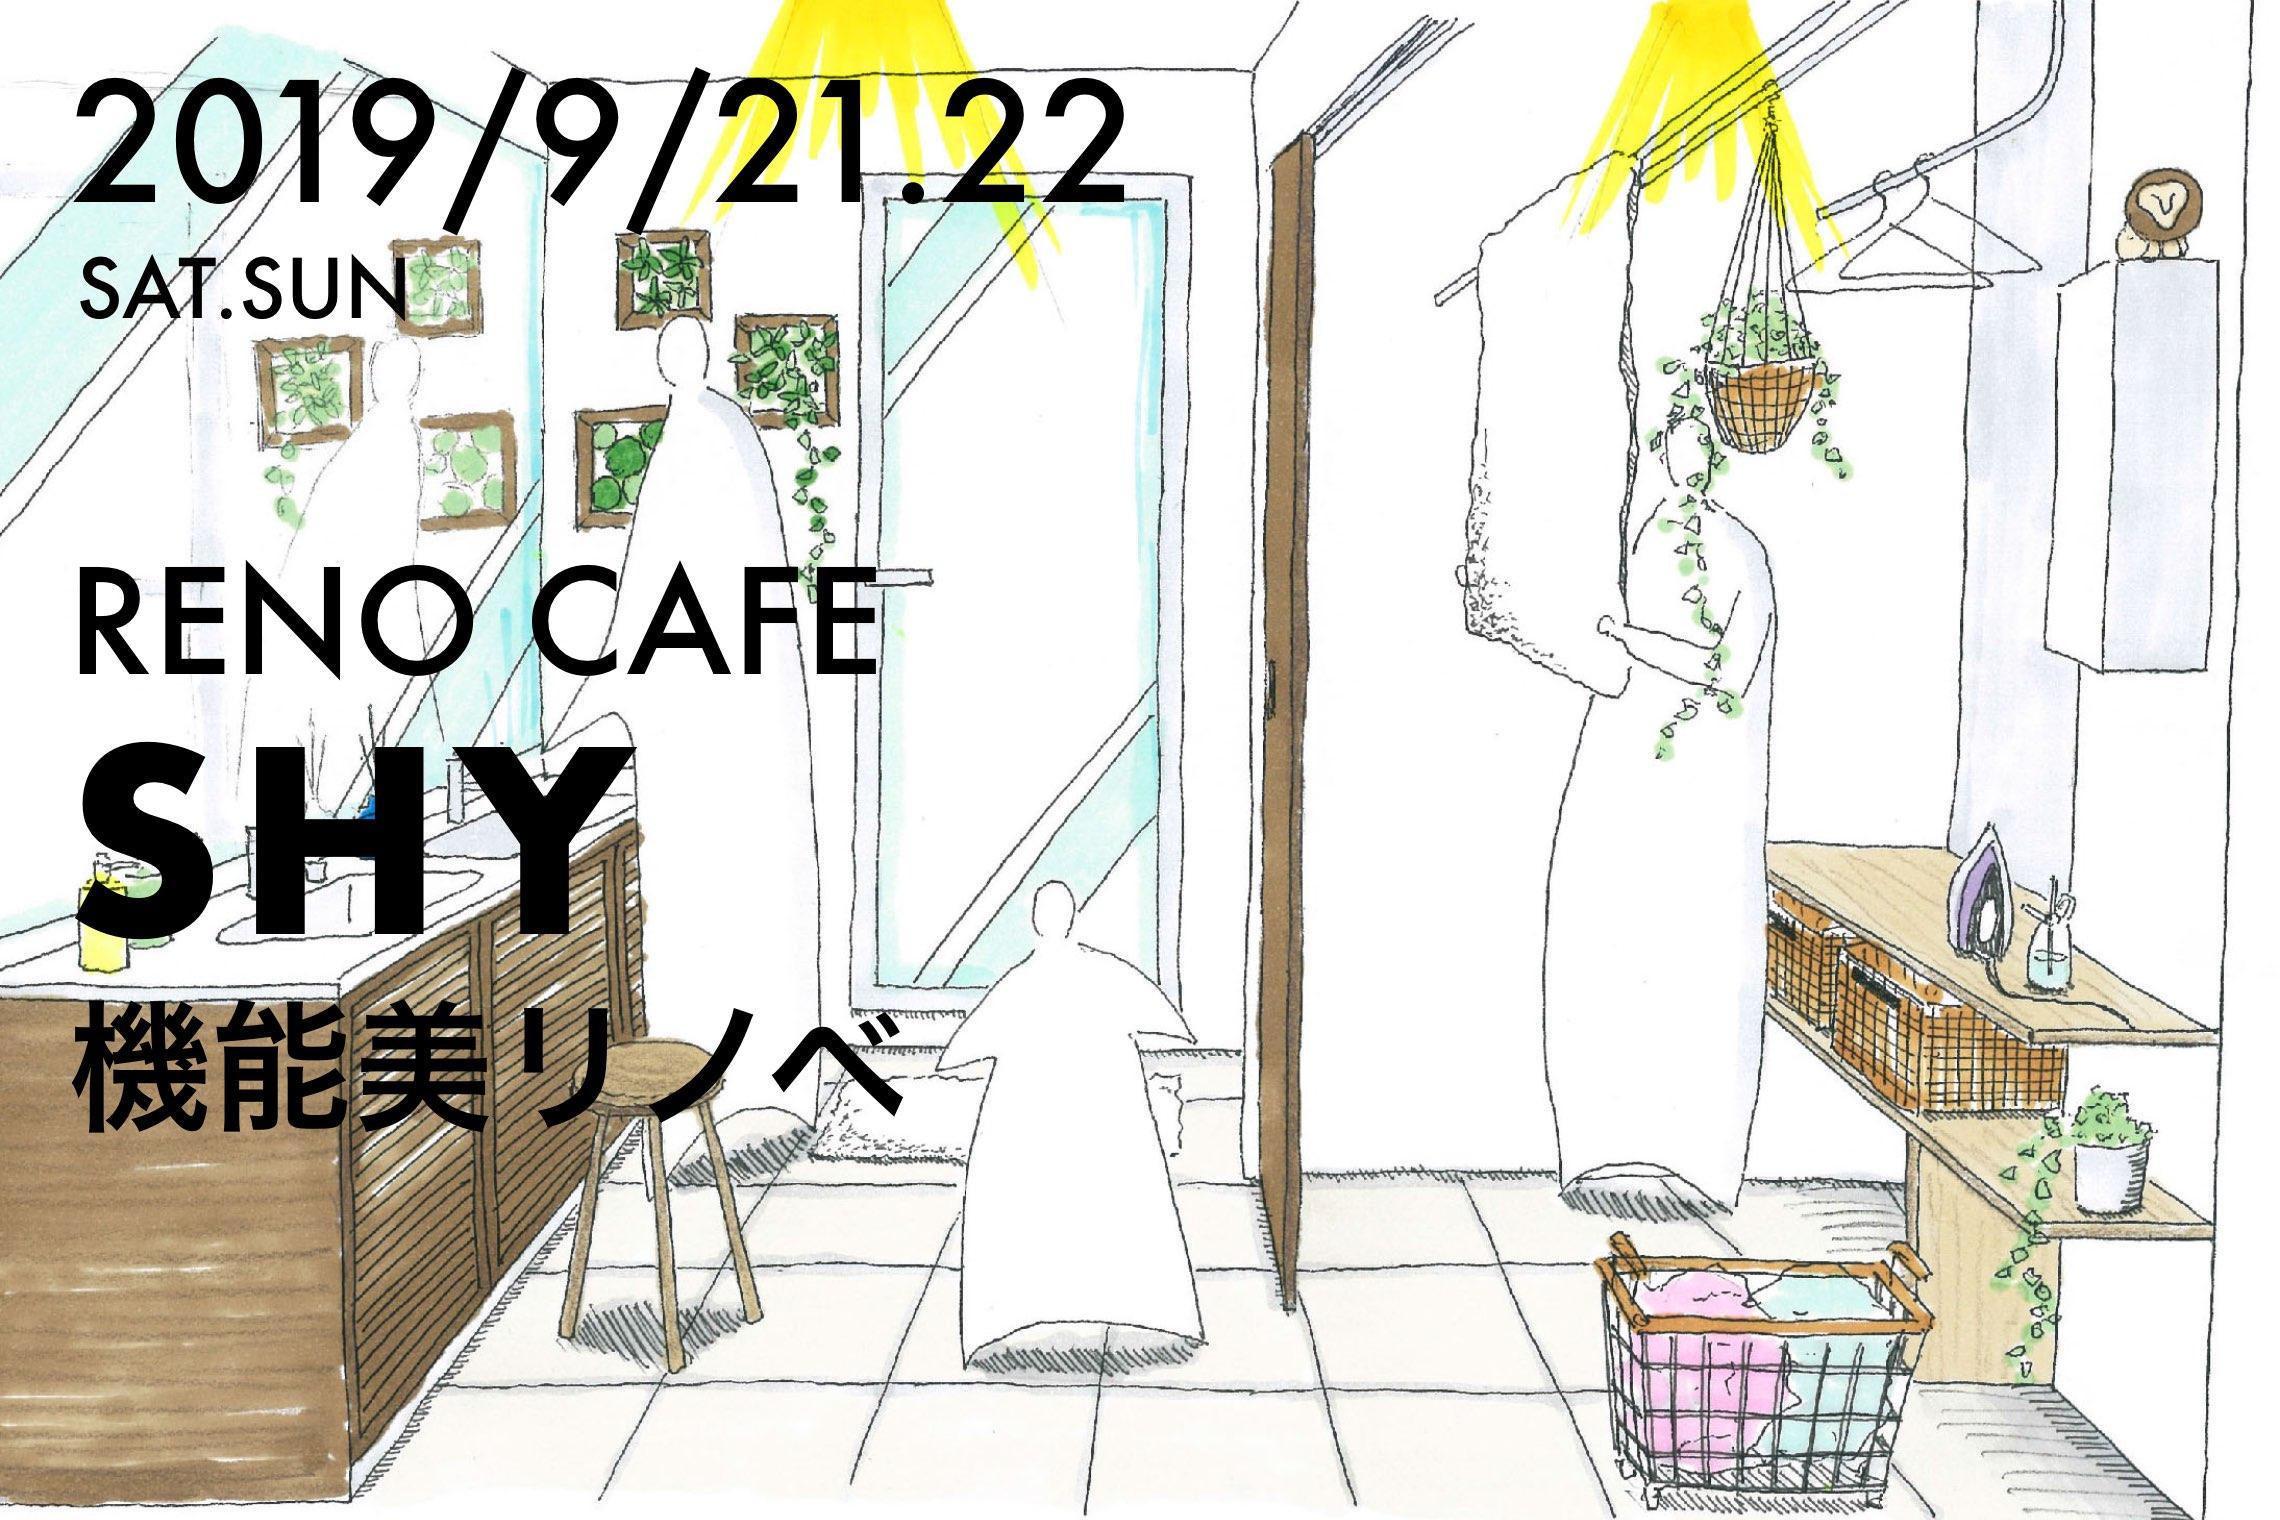 RENO CAFE「SHY」(完成見学会)